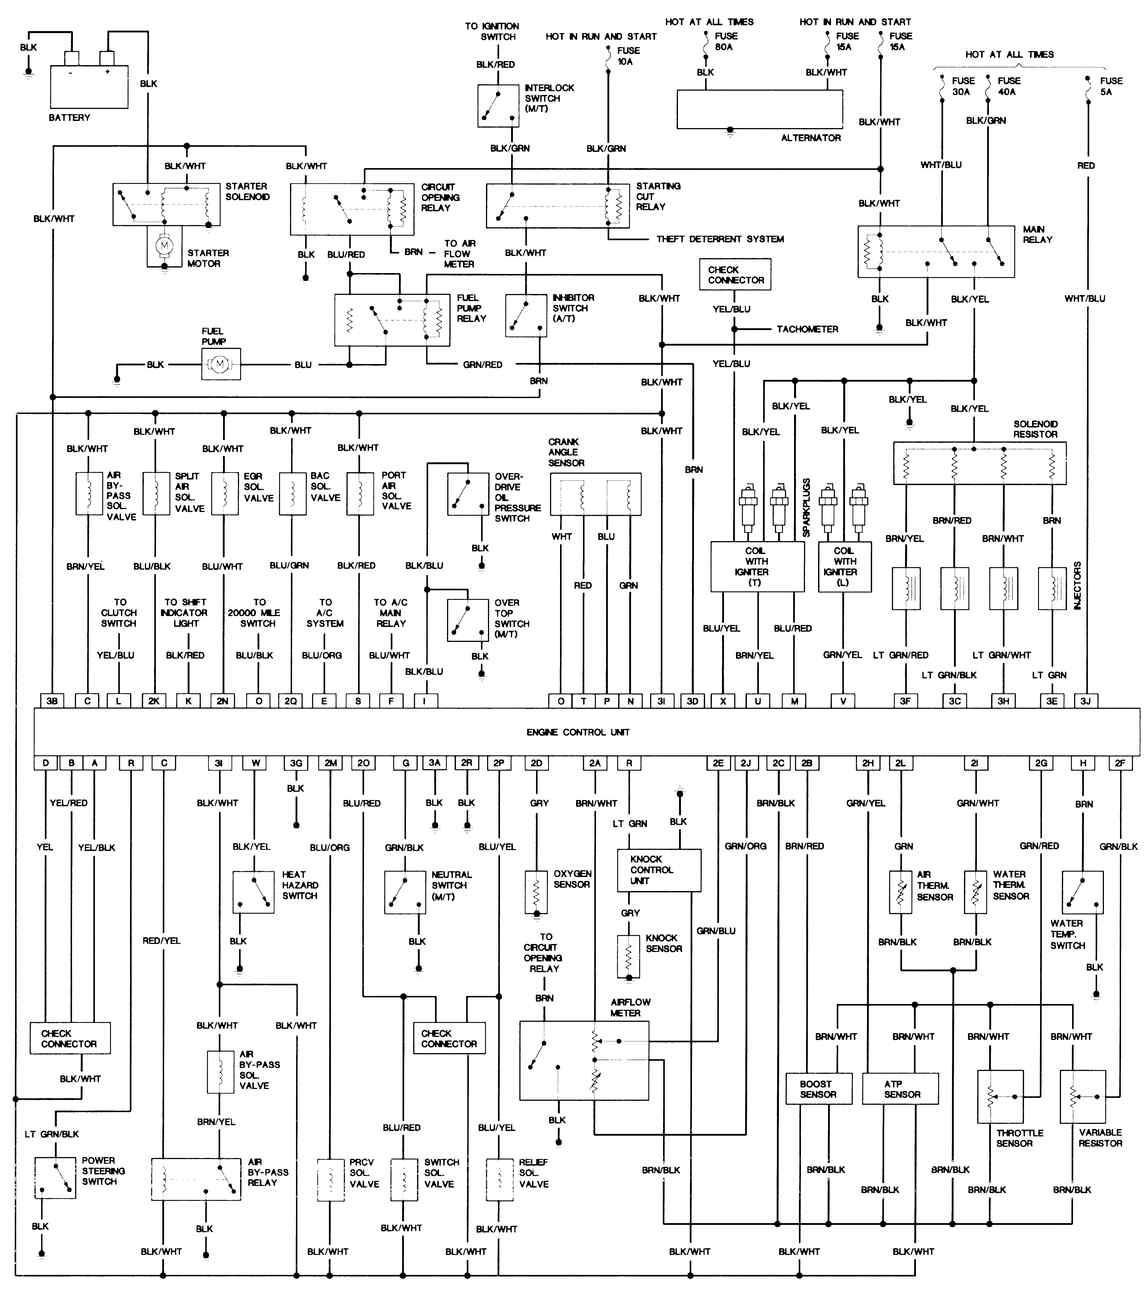 1981 mazda rx 7 electrical wiring diagram